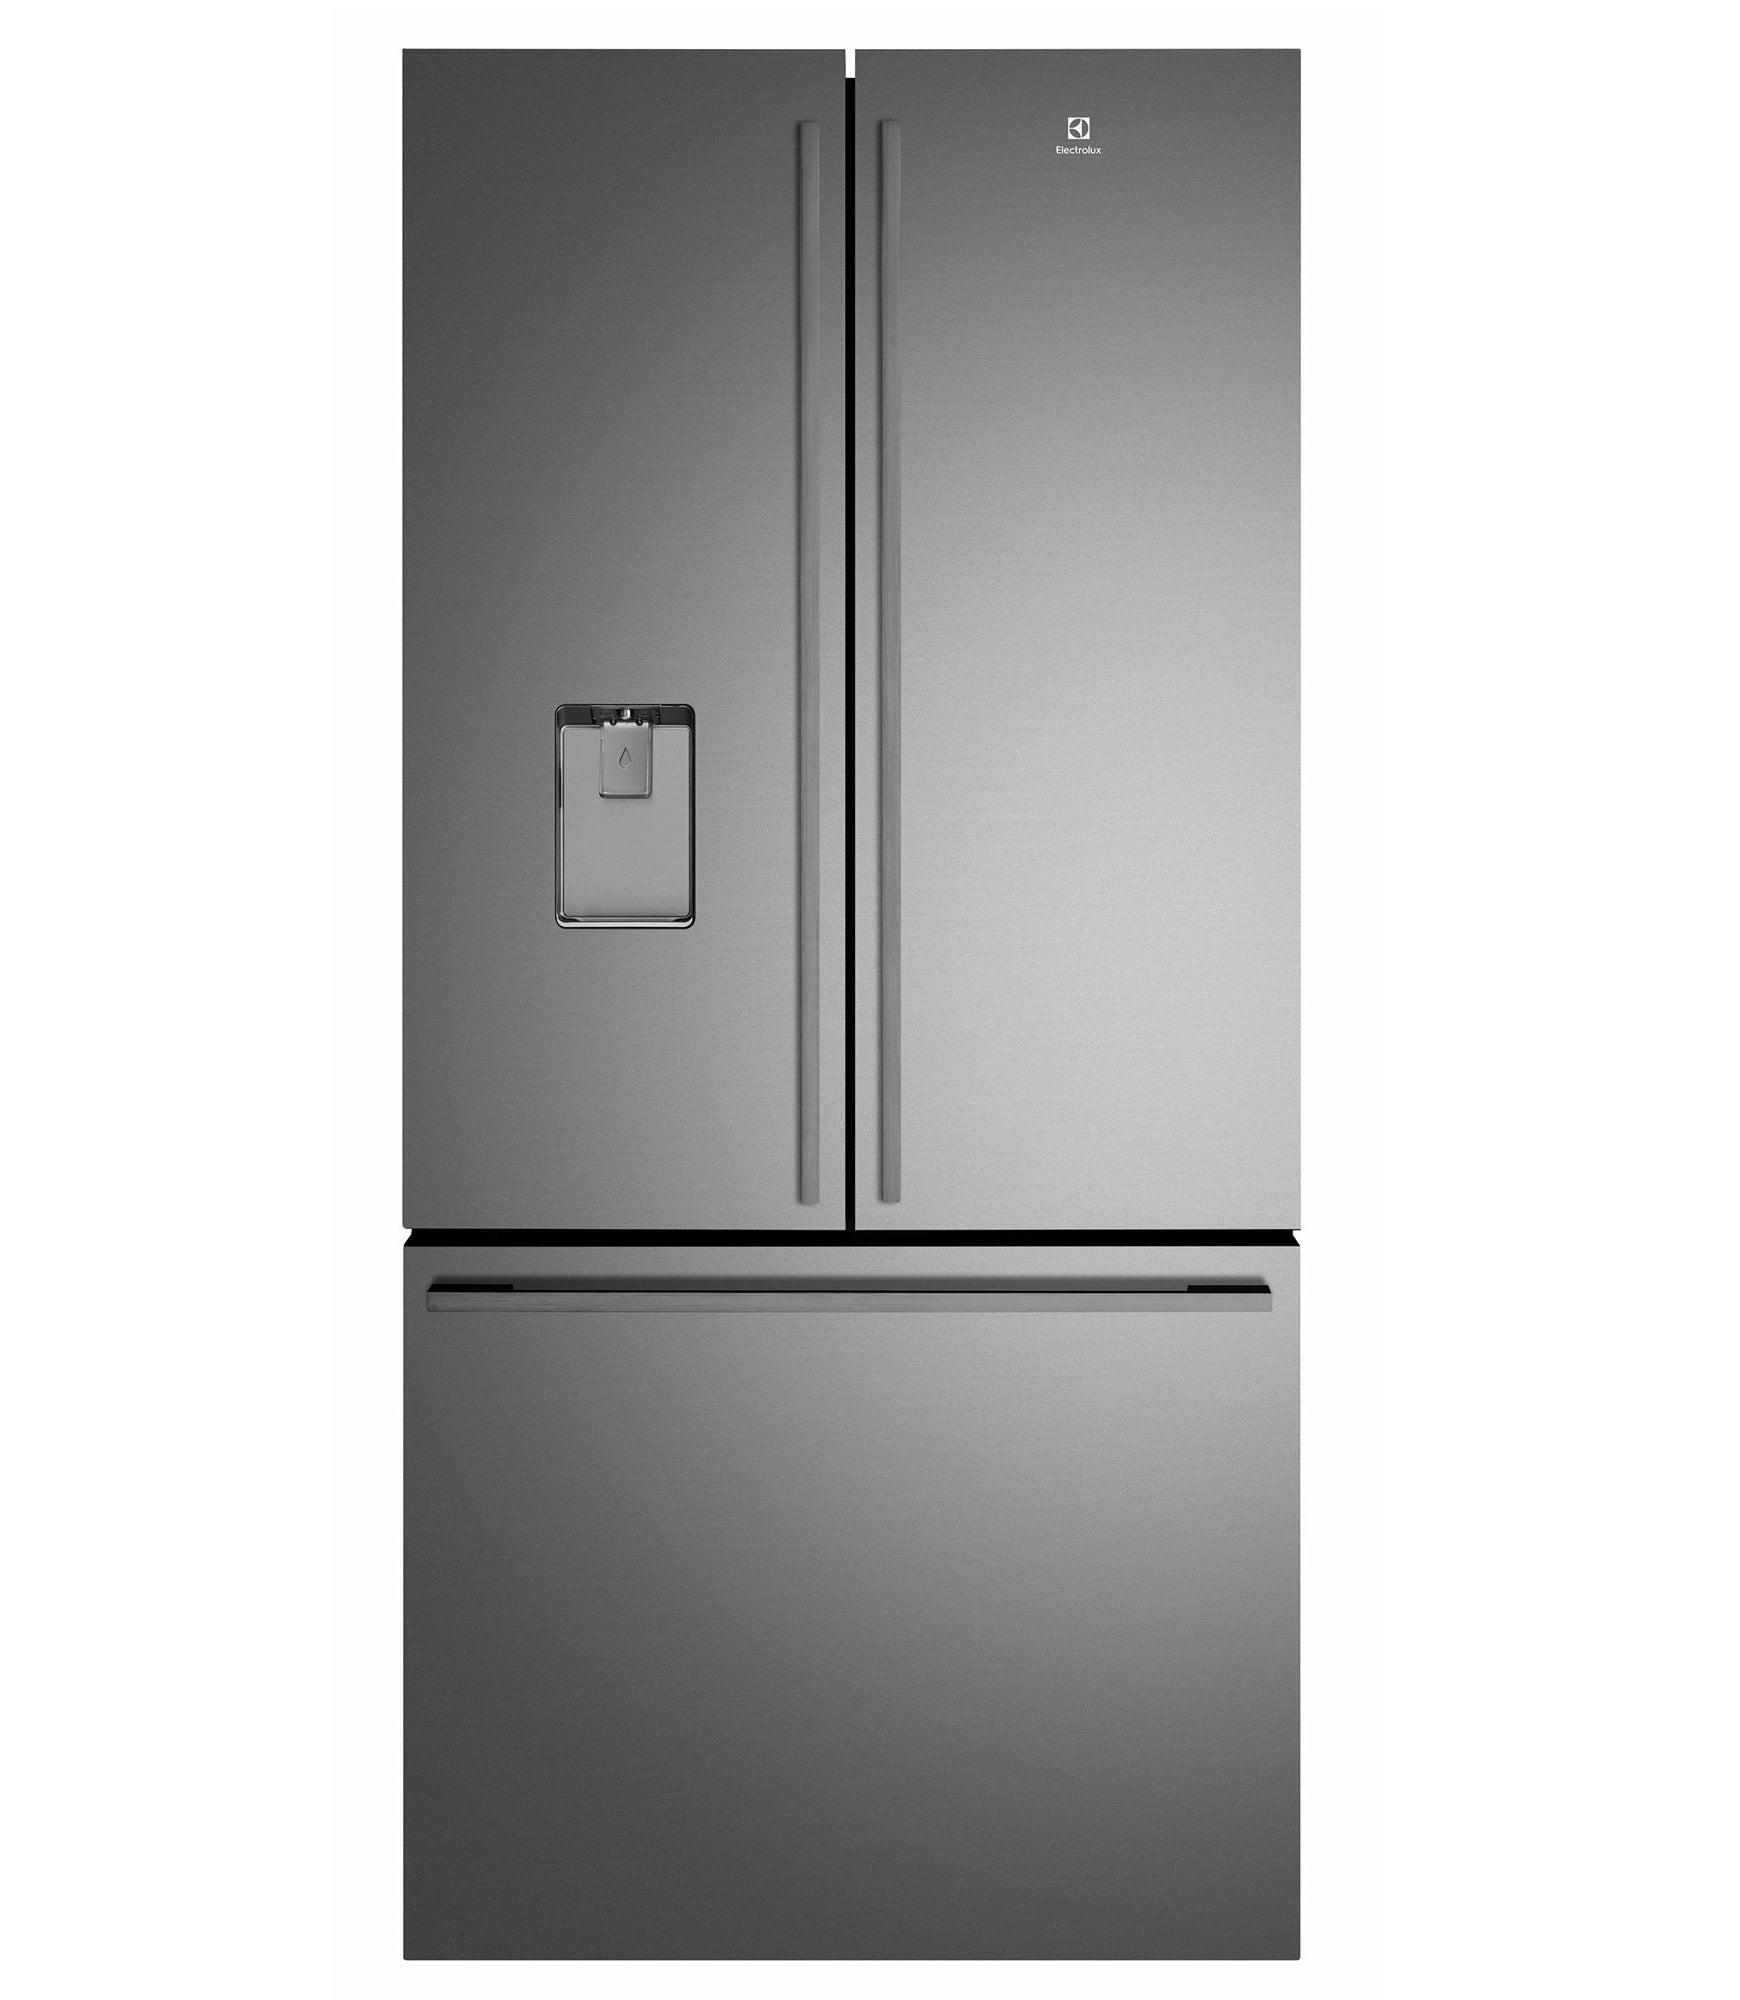 Electrolux EHE5267BC Refrigerator